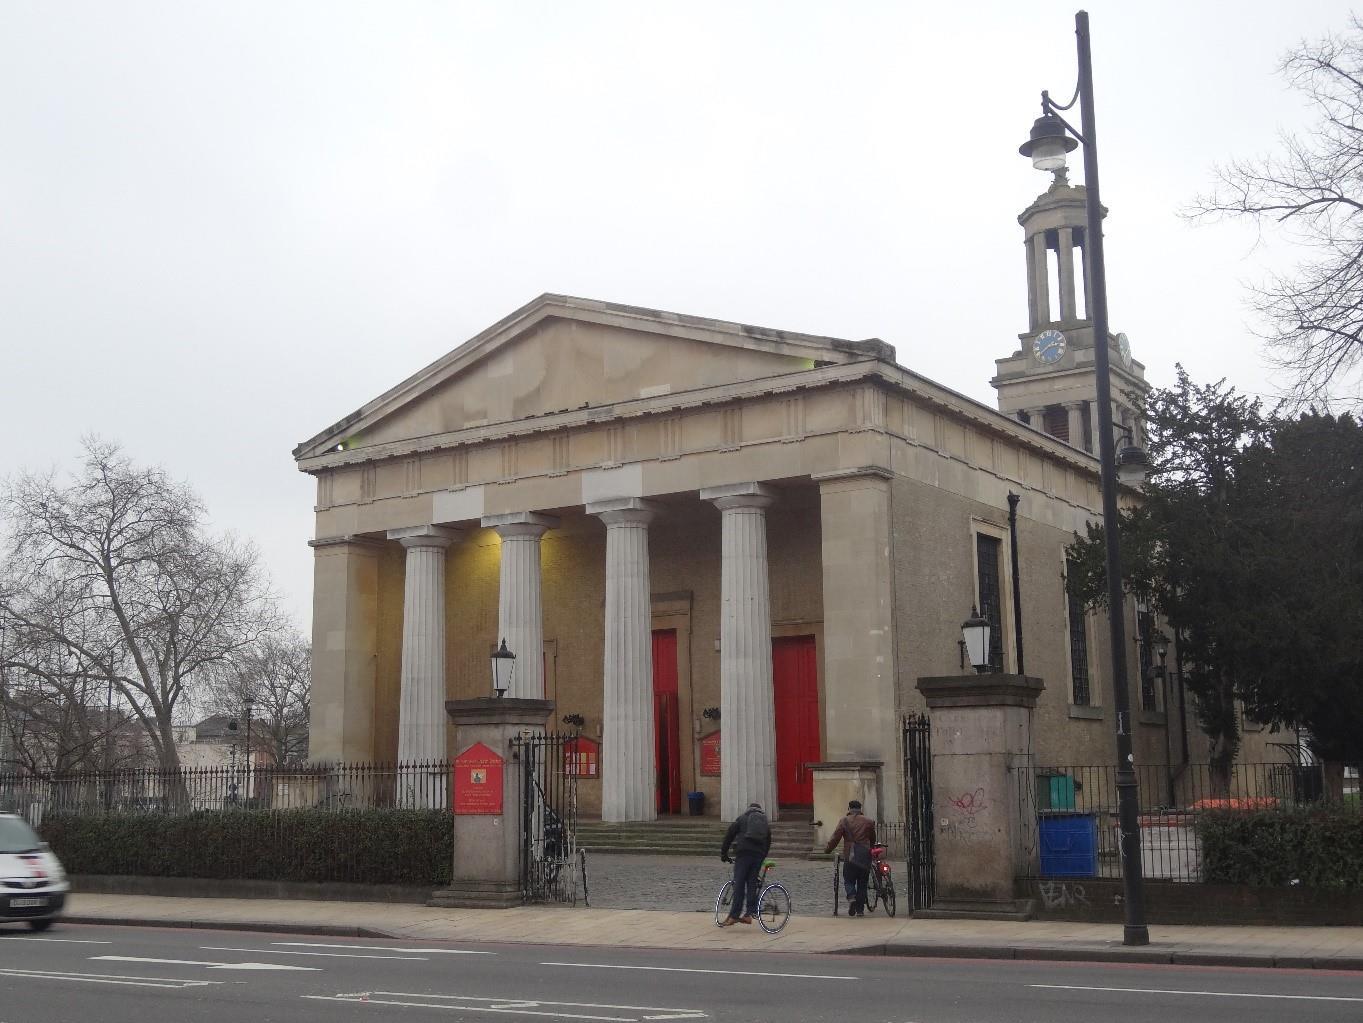 Brixton Hill, London, SW2 - Andrew Scott Robertson